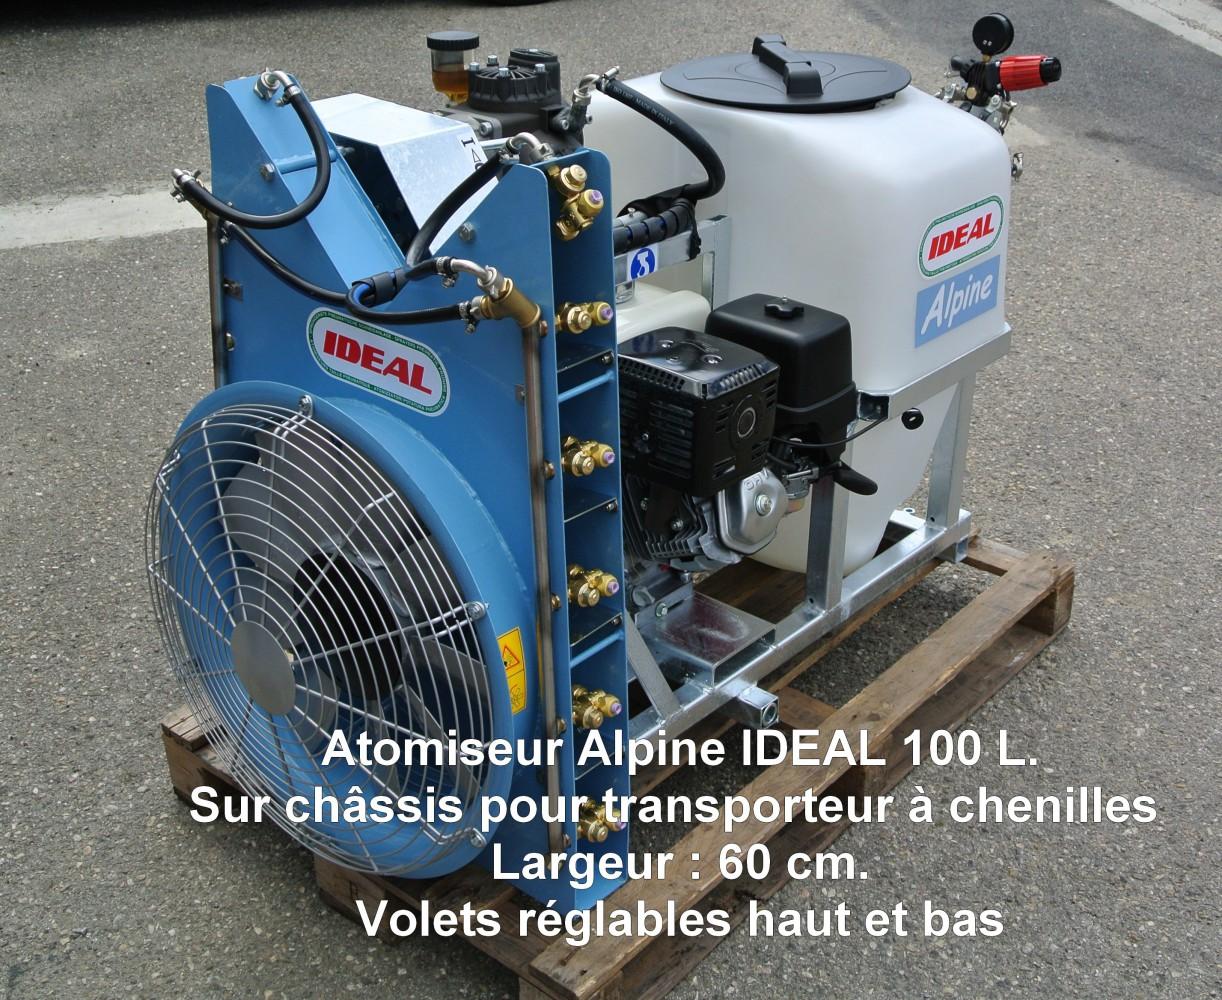 Atomiseur Alpine IDEAL 100 L.